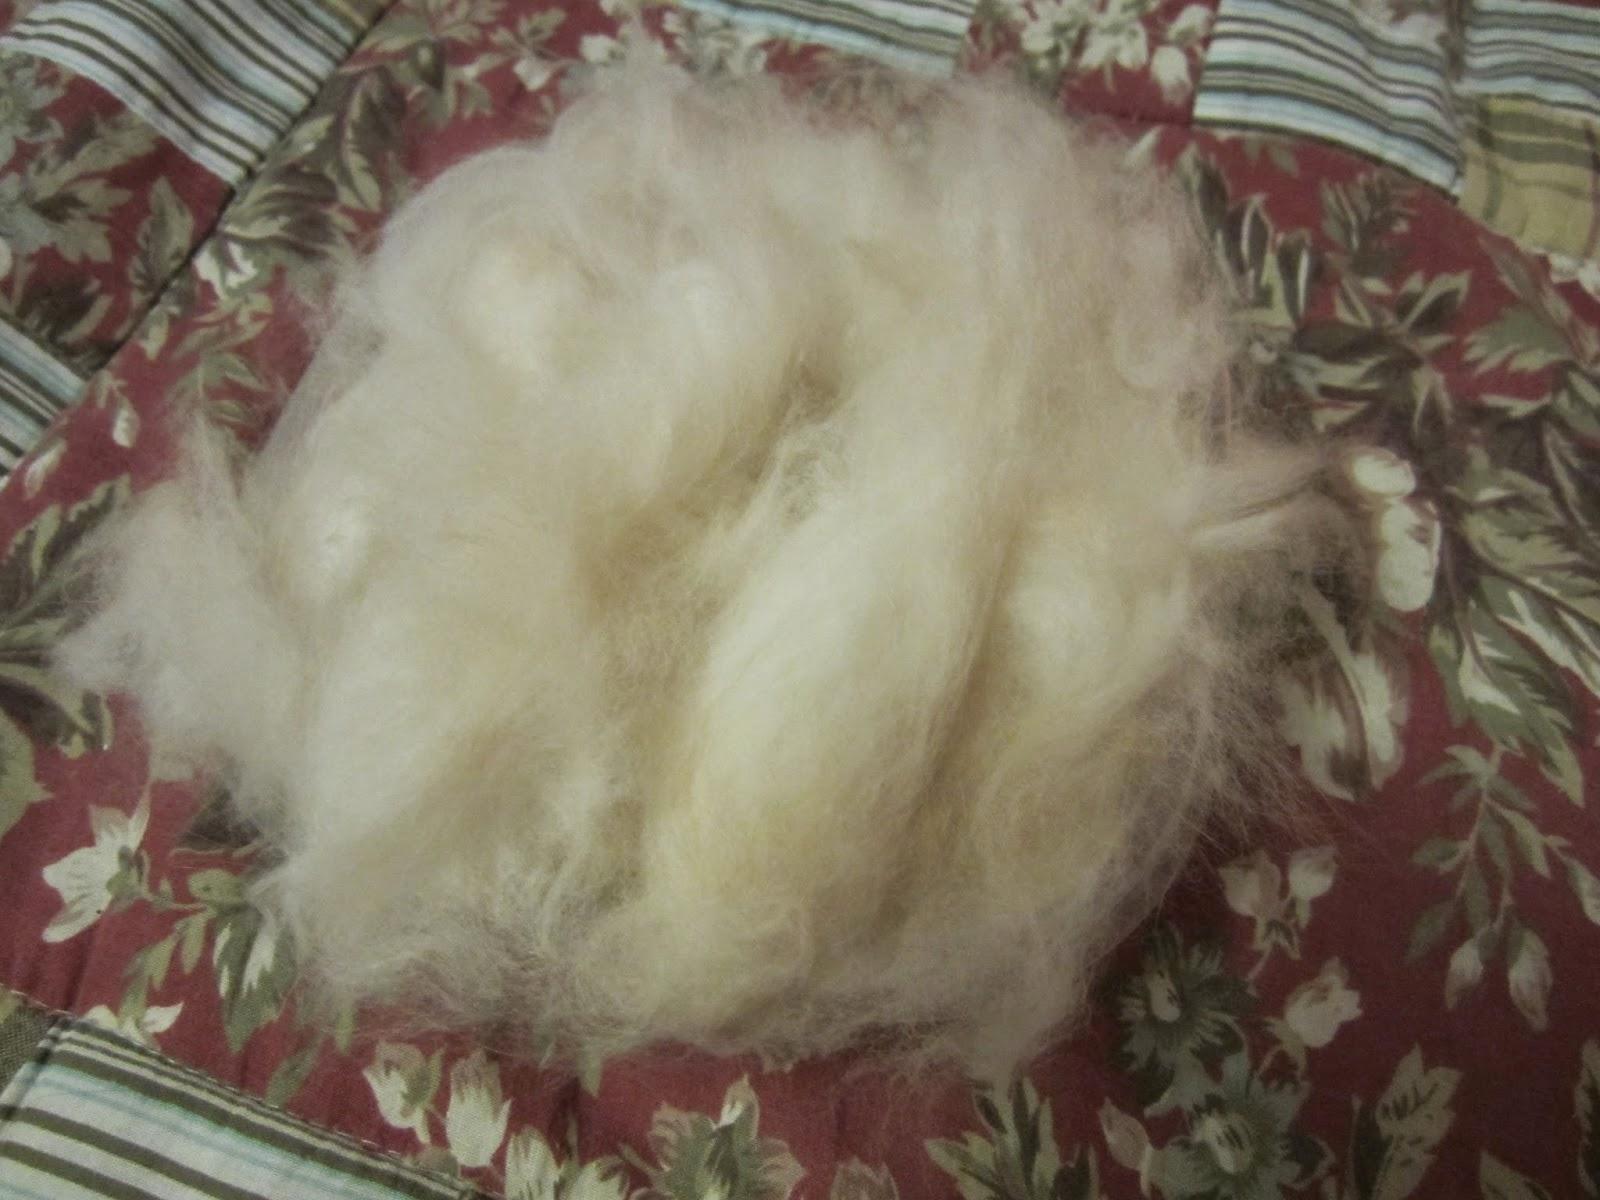 https://www.etsy.com/listing/190260630/cloud-soft-purebred-french-angora-fiber?ref=listing-0